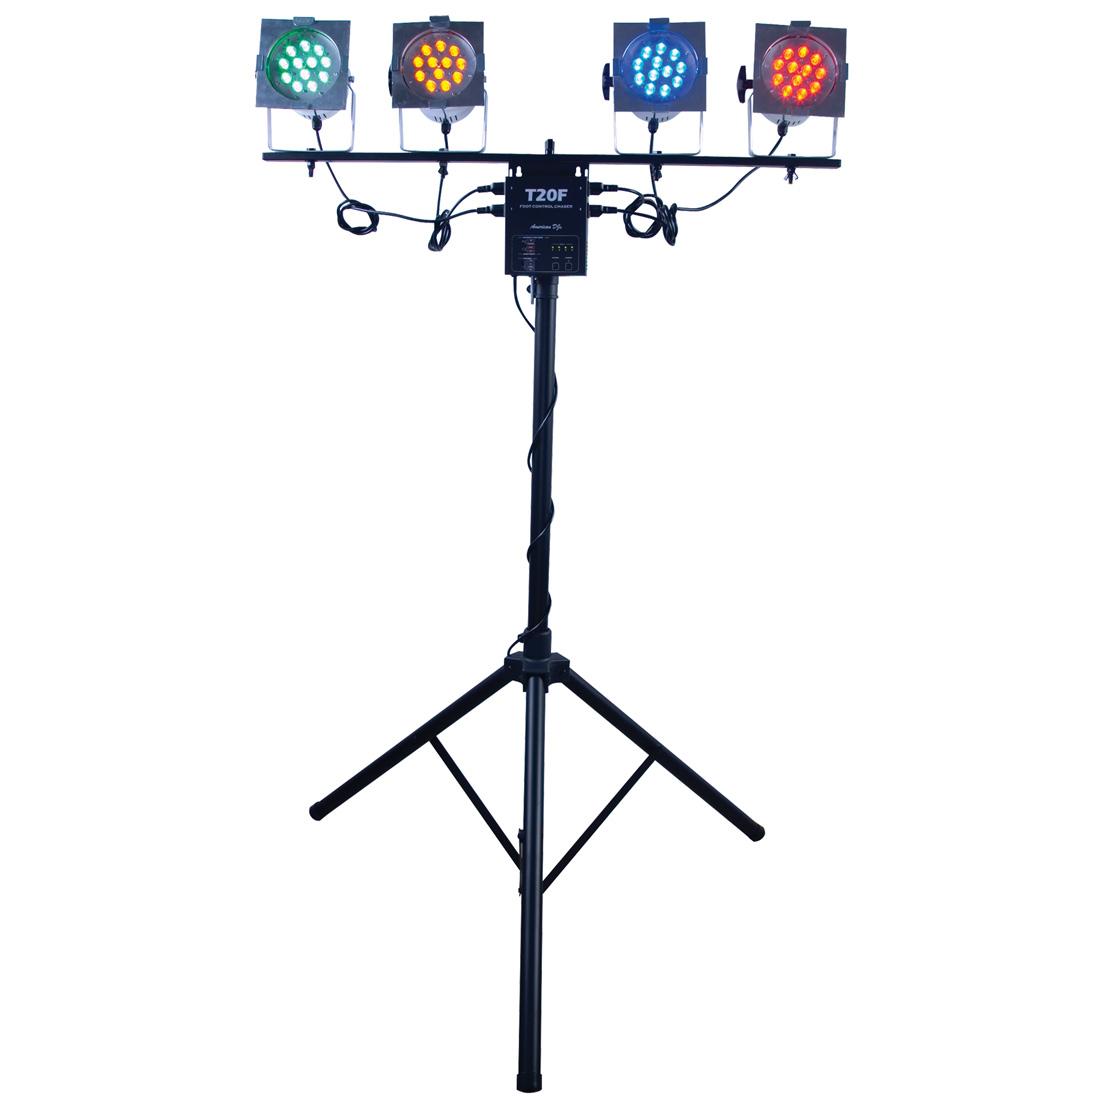 LS-80 LED System